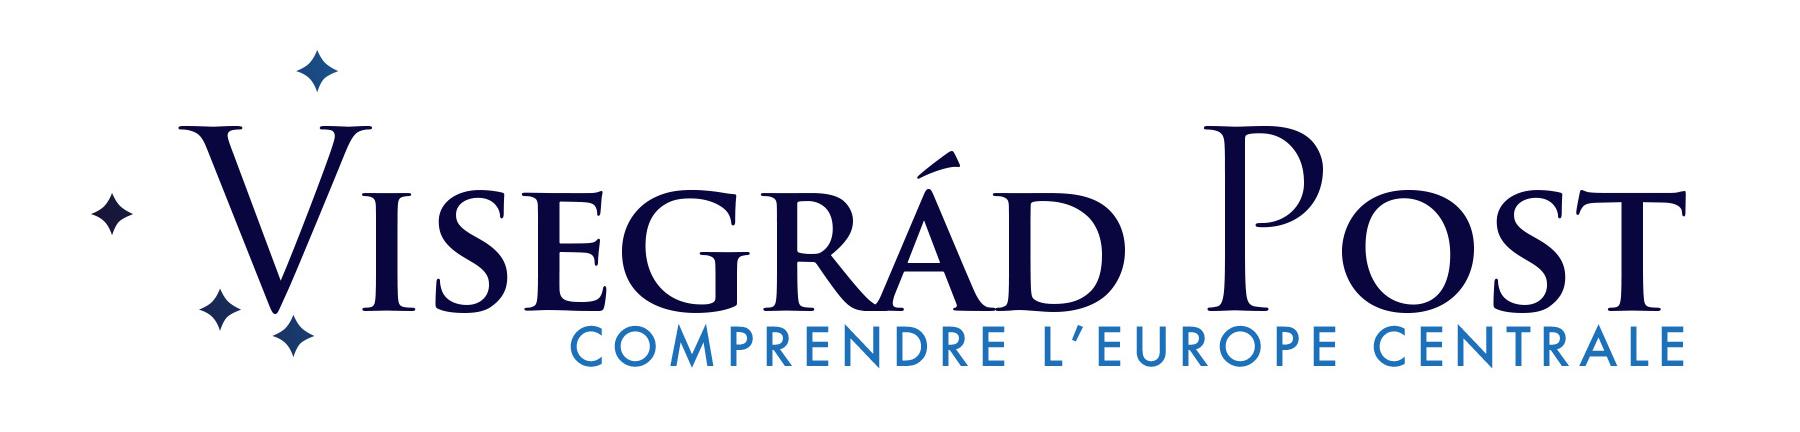 fr-Logo-Visegrad-Post_crop